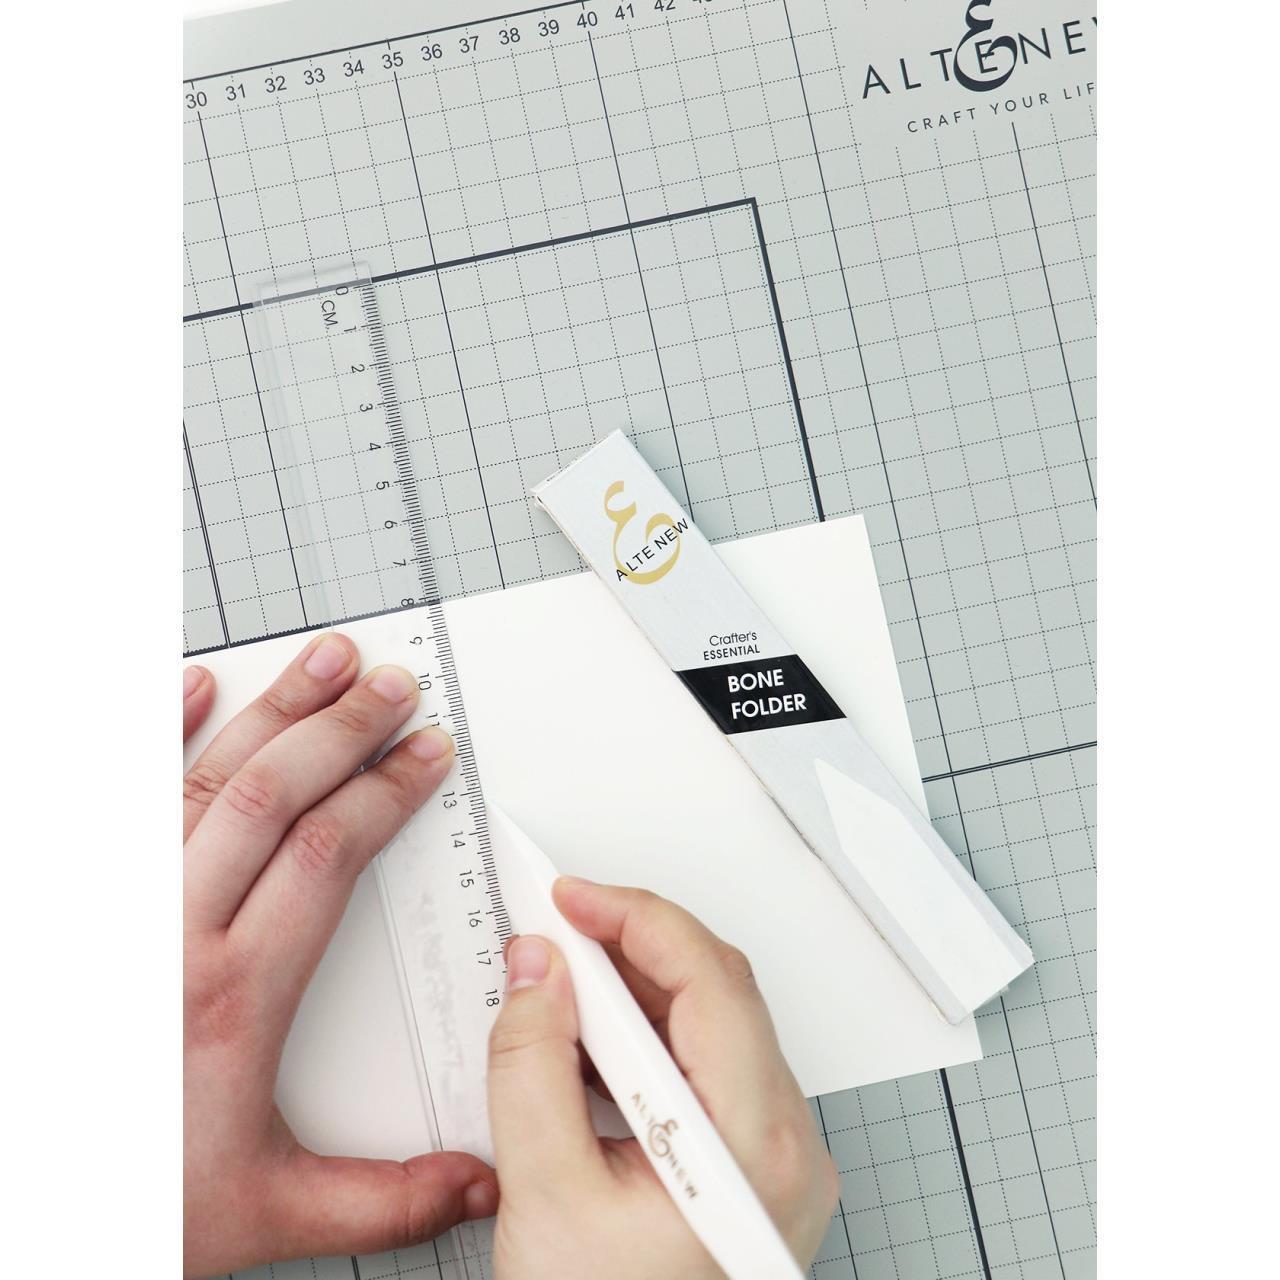 Crafter's Essential Bone Folder, Altenew Tools -